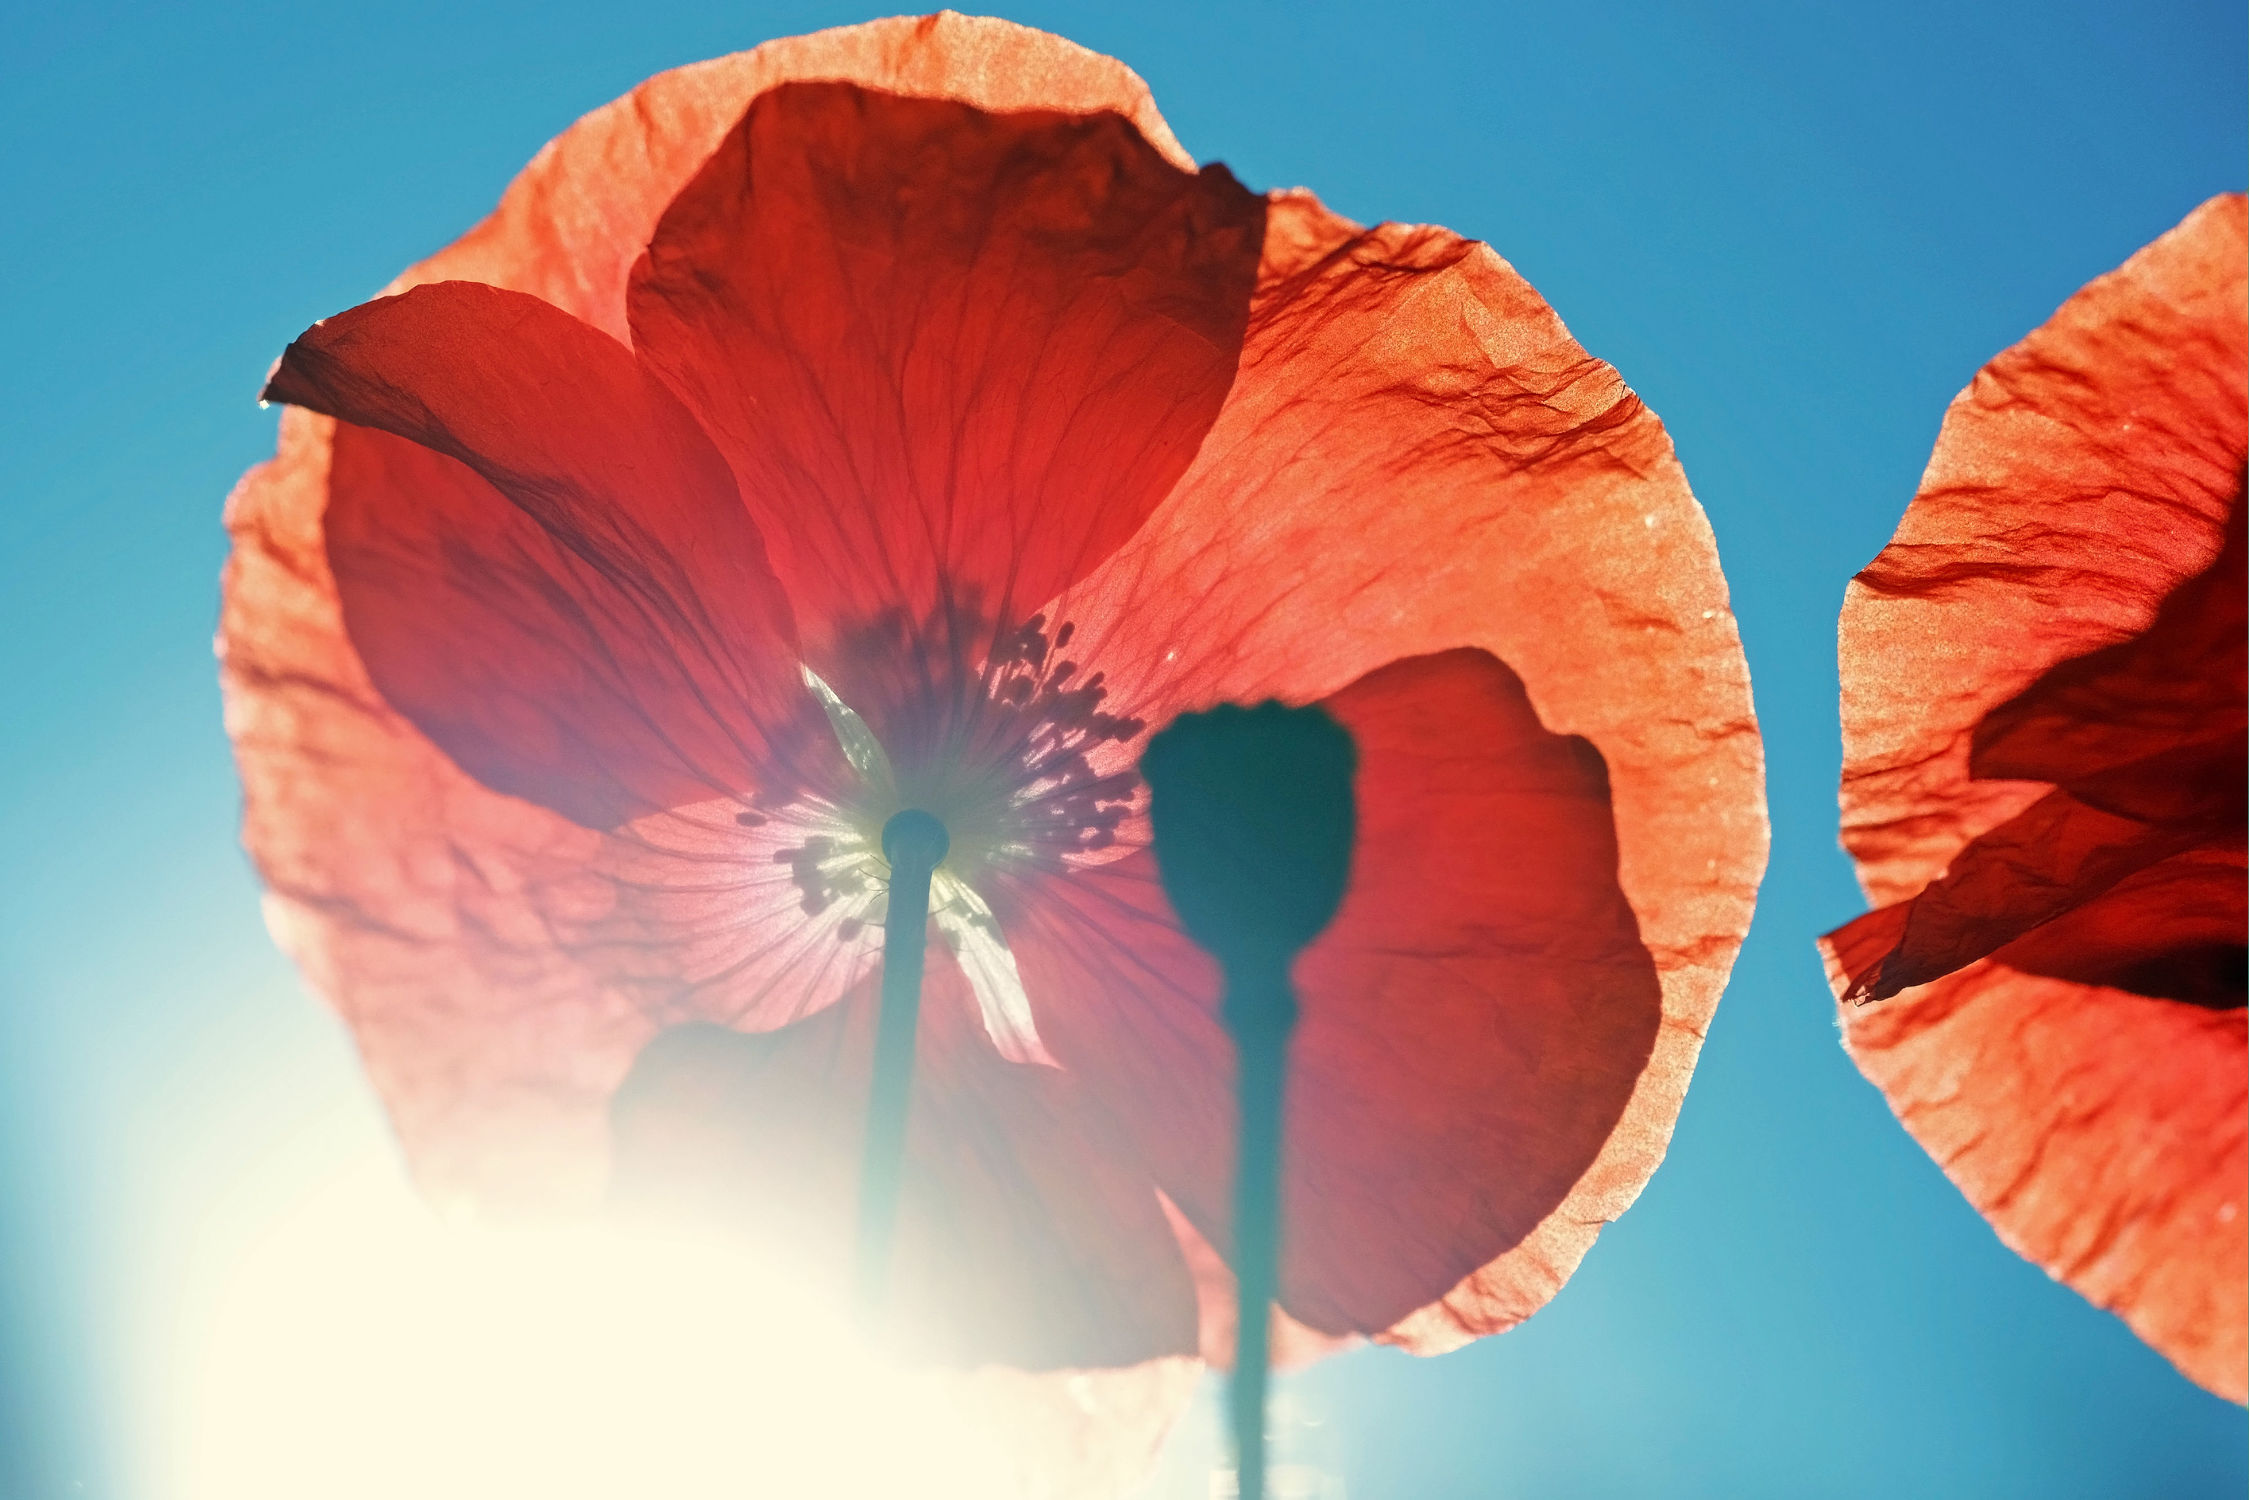 Bild mit Frühling, Frühling, Mohn, Sonne, Mohnblume, Mohnfeld, Mohnblüte, Gegenlicht, Licht, Mohnblumen, Wind, mohnblüten